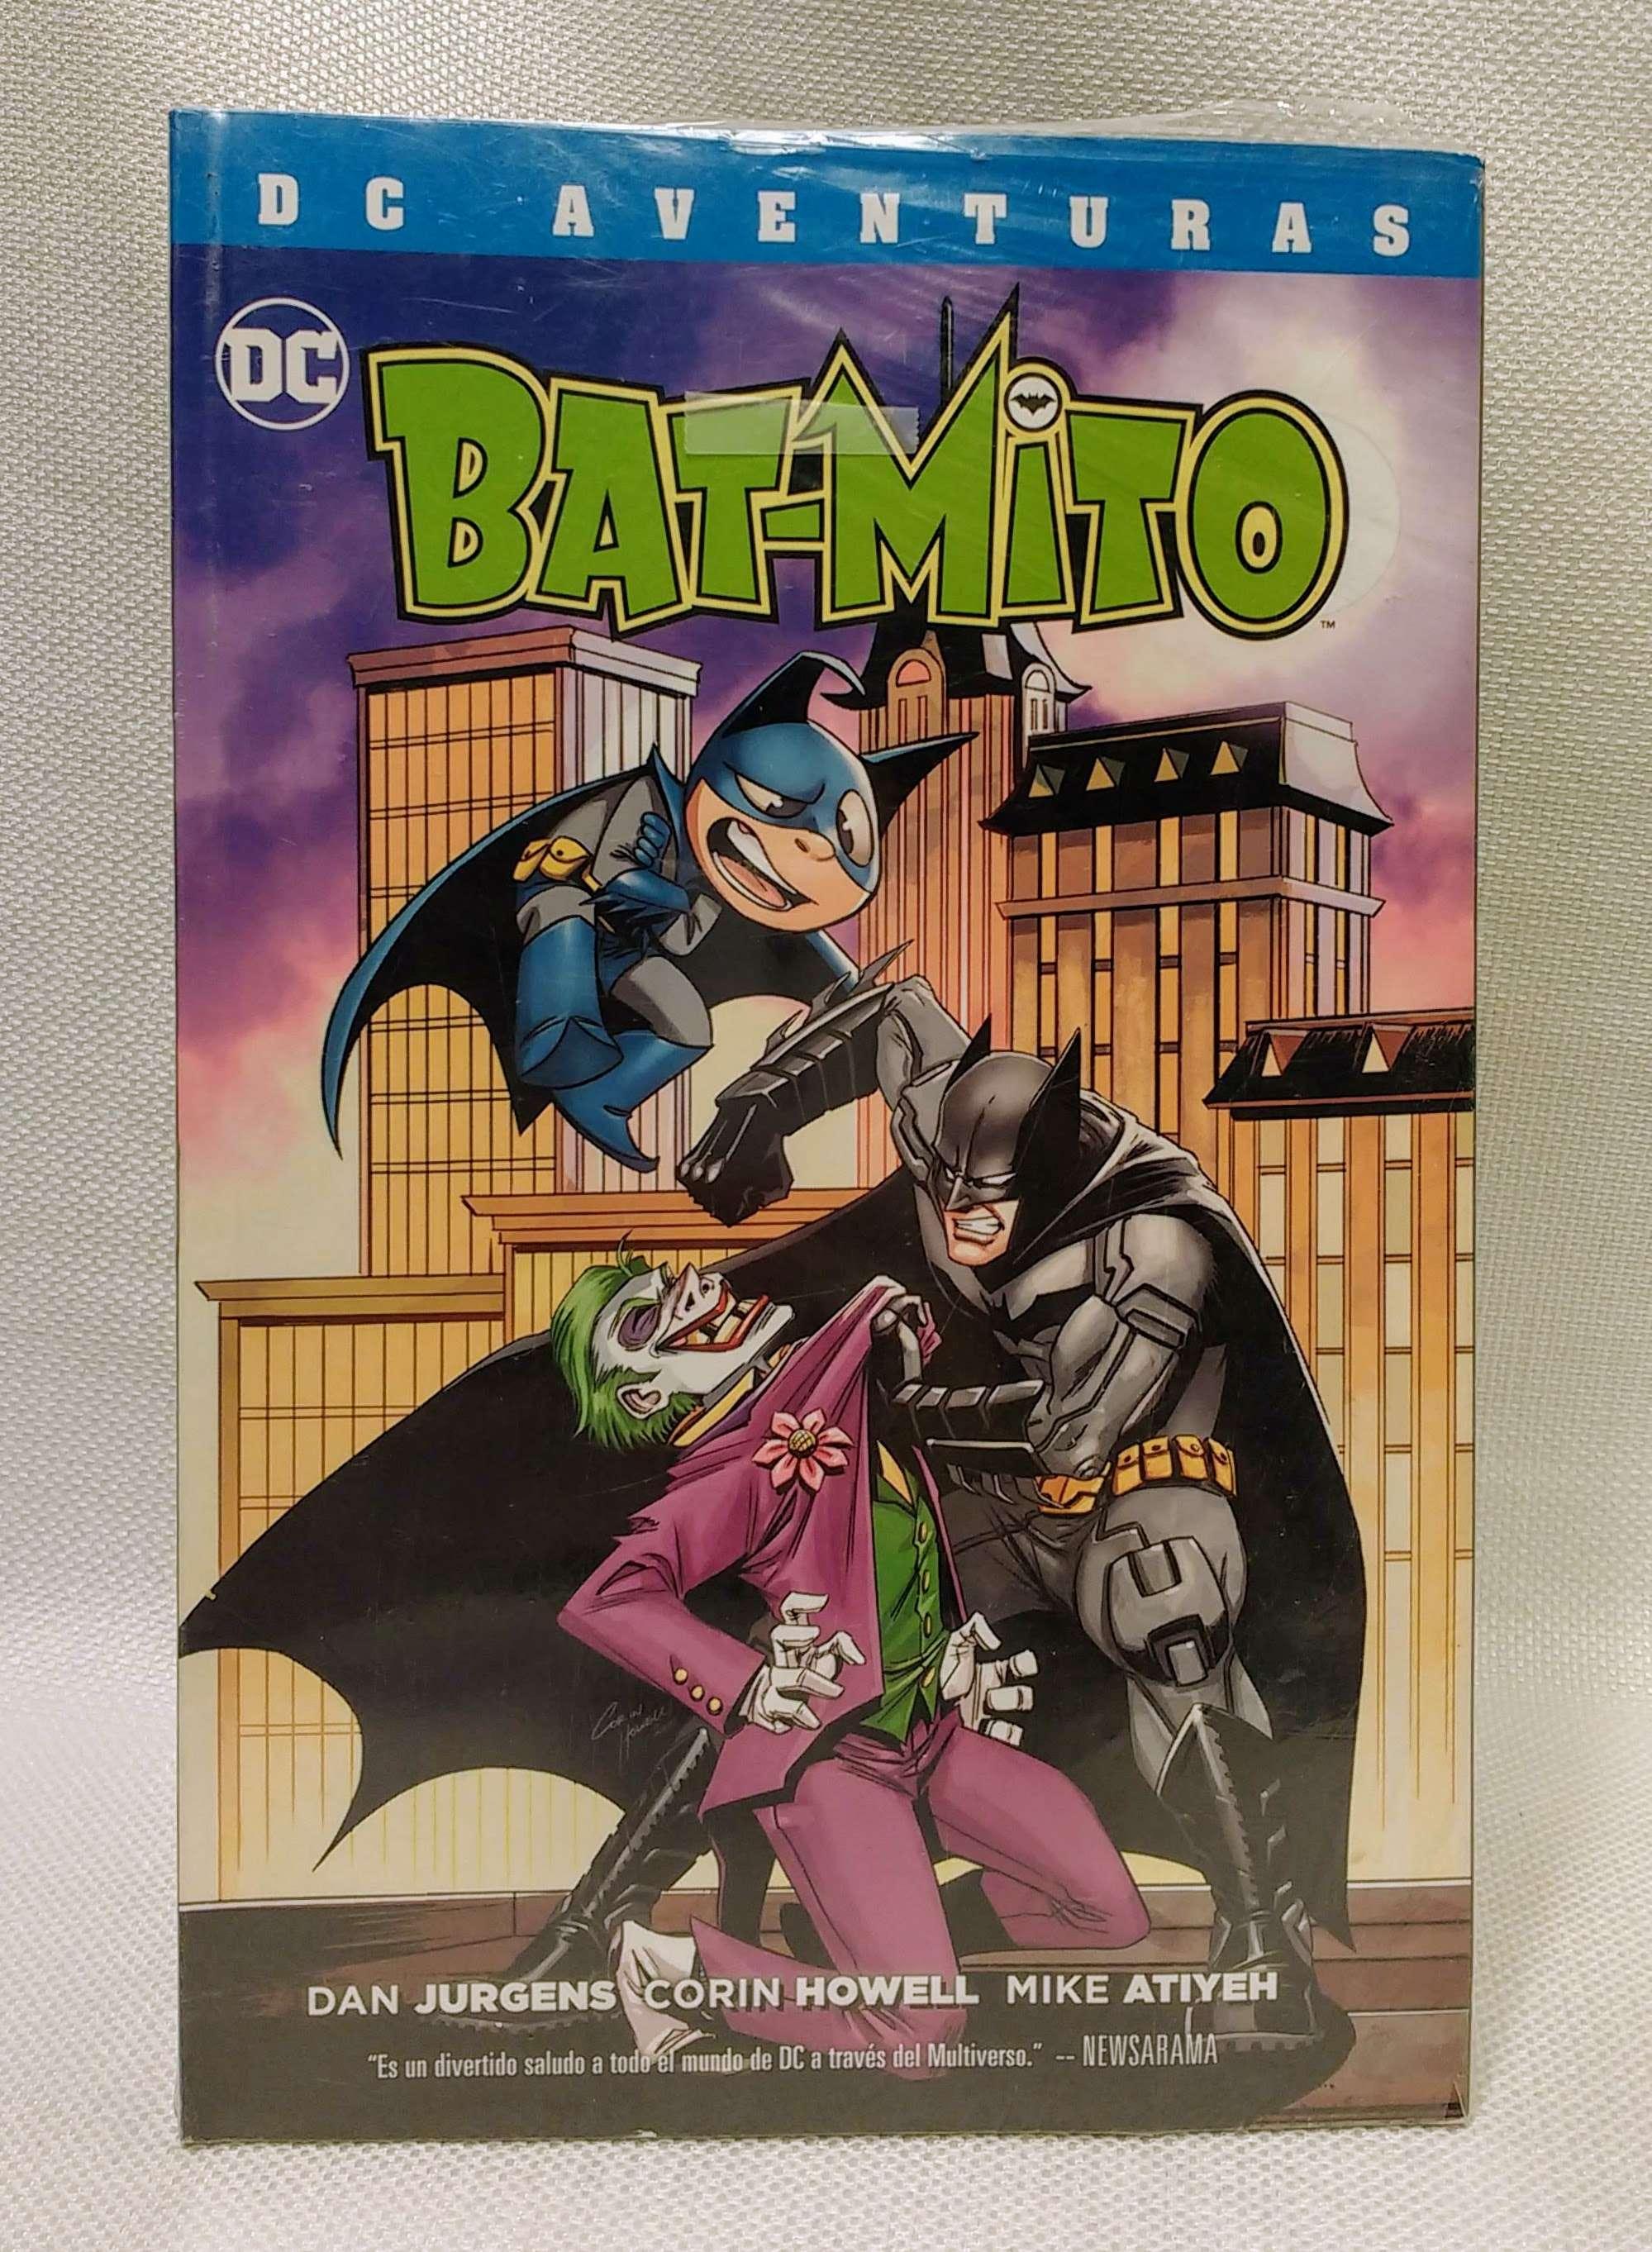 Bat-Mito (DC Aventuras), Jurgens, Dan; Howell, Corin; Atiyeh, Mike